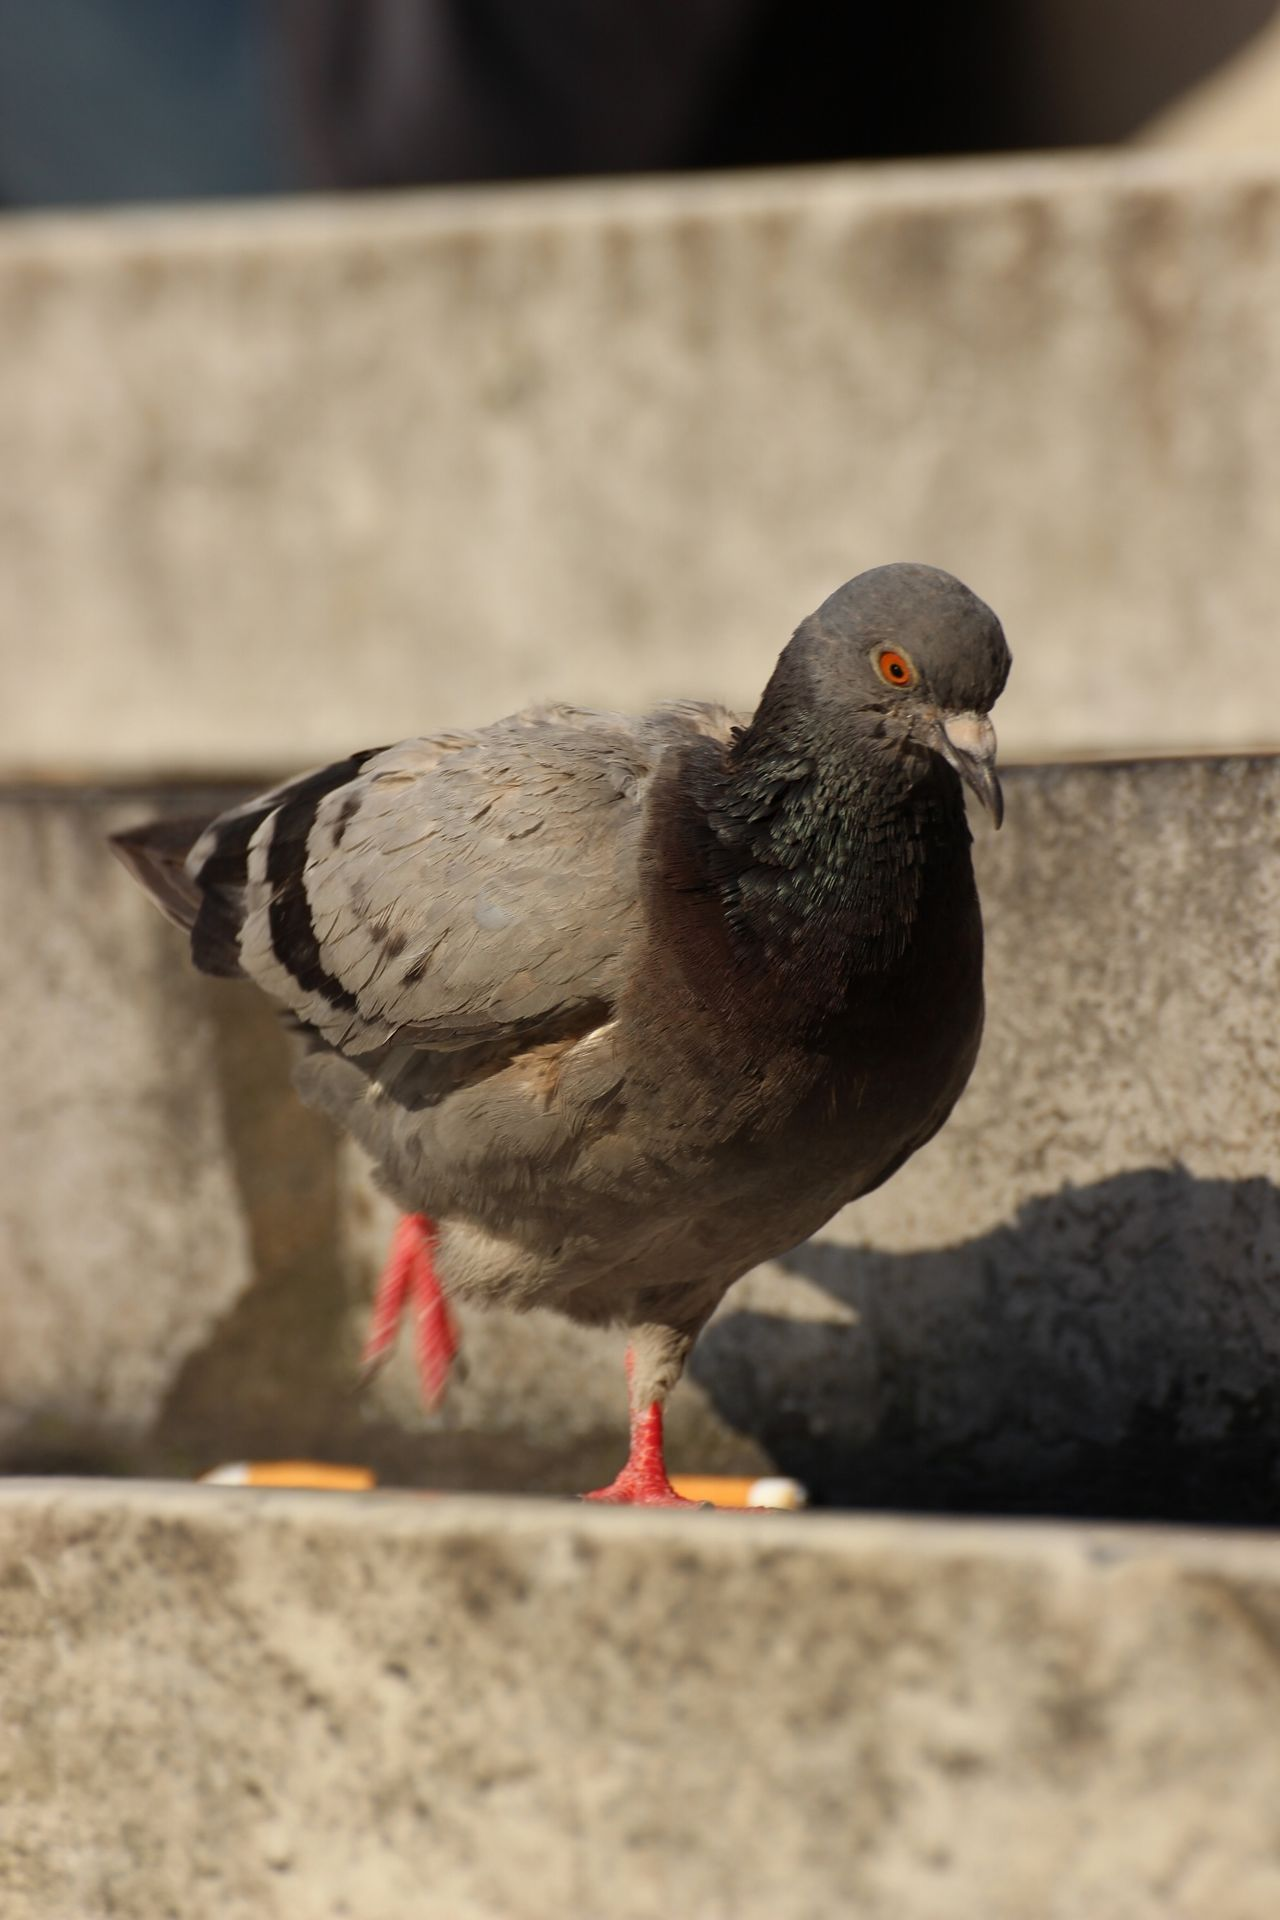 Animal Poll Animal Themes Bird Cigarettes Close-up One Animal Picoftheday Pigeon Pigeonslife Pollution Walking